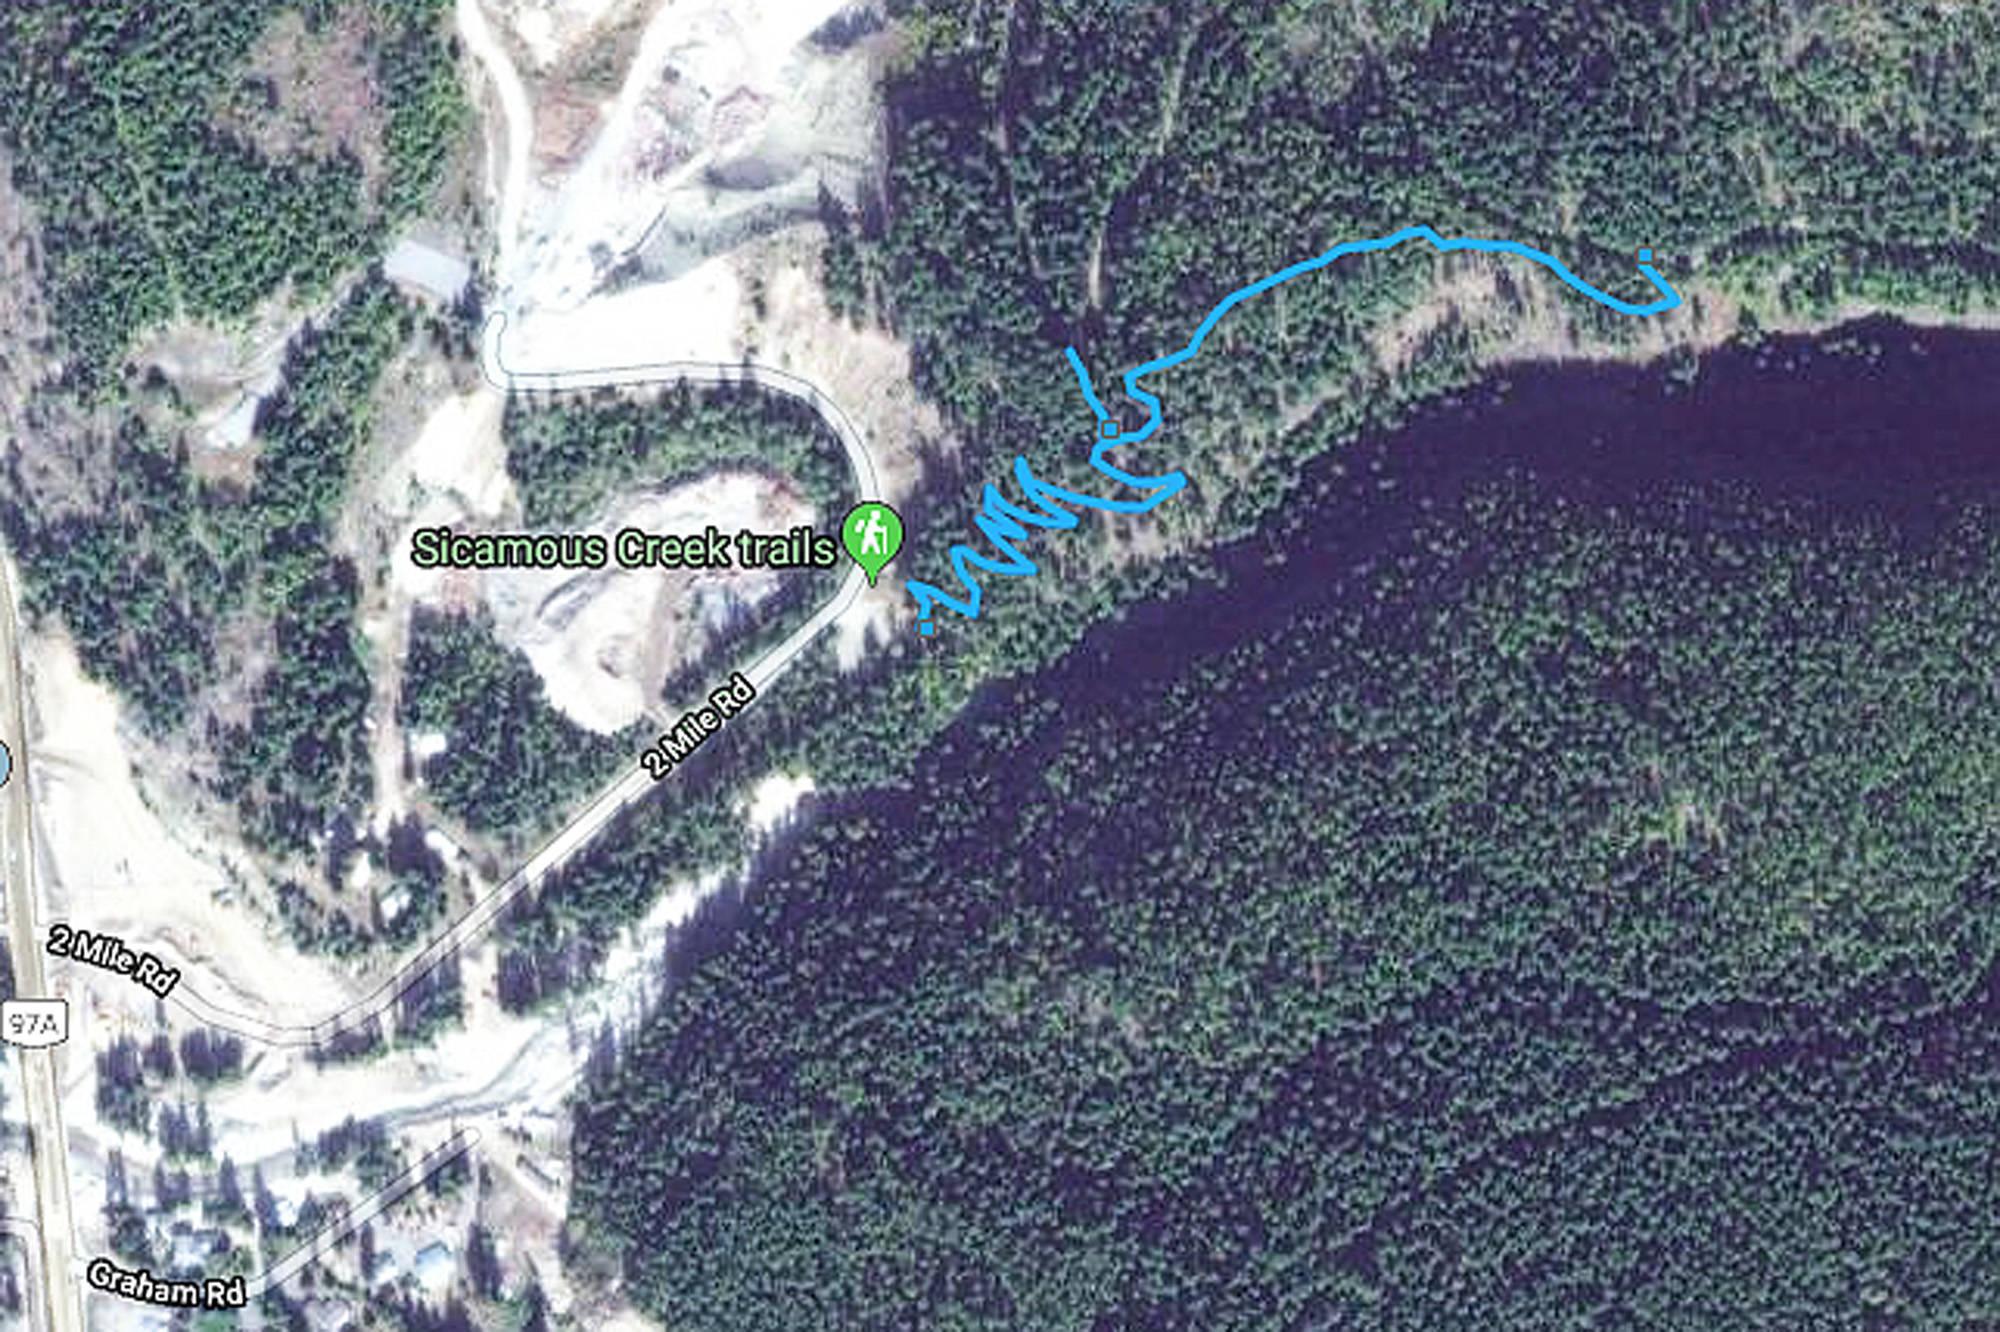 Alberta man dies after plunge from B C  waterfalls, marking